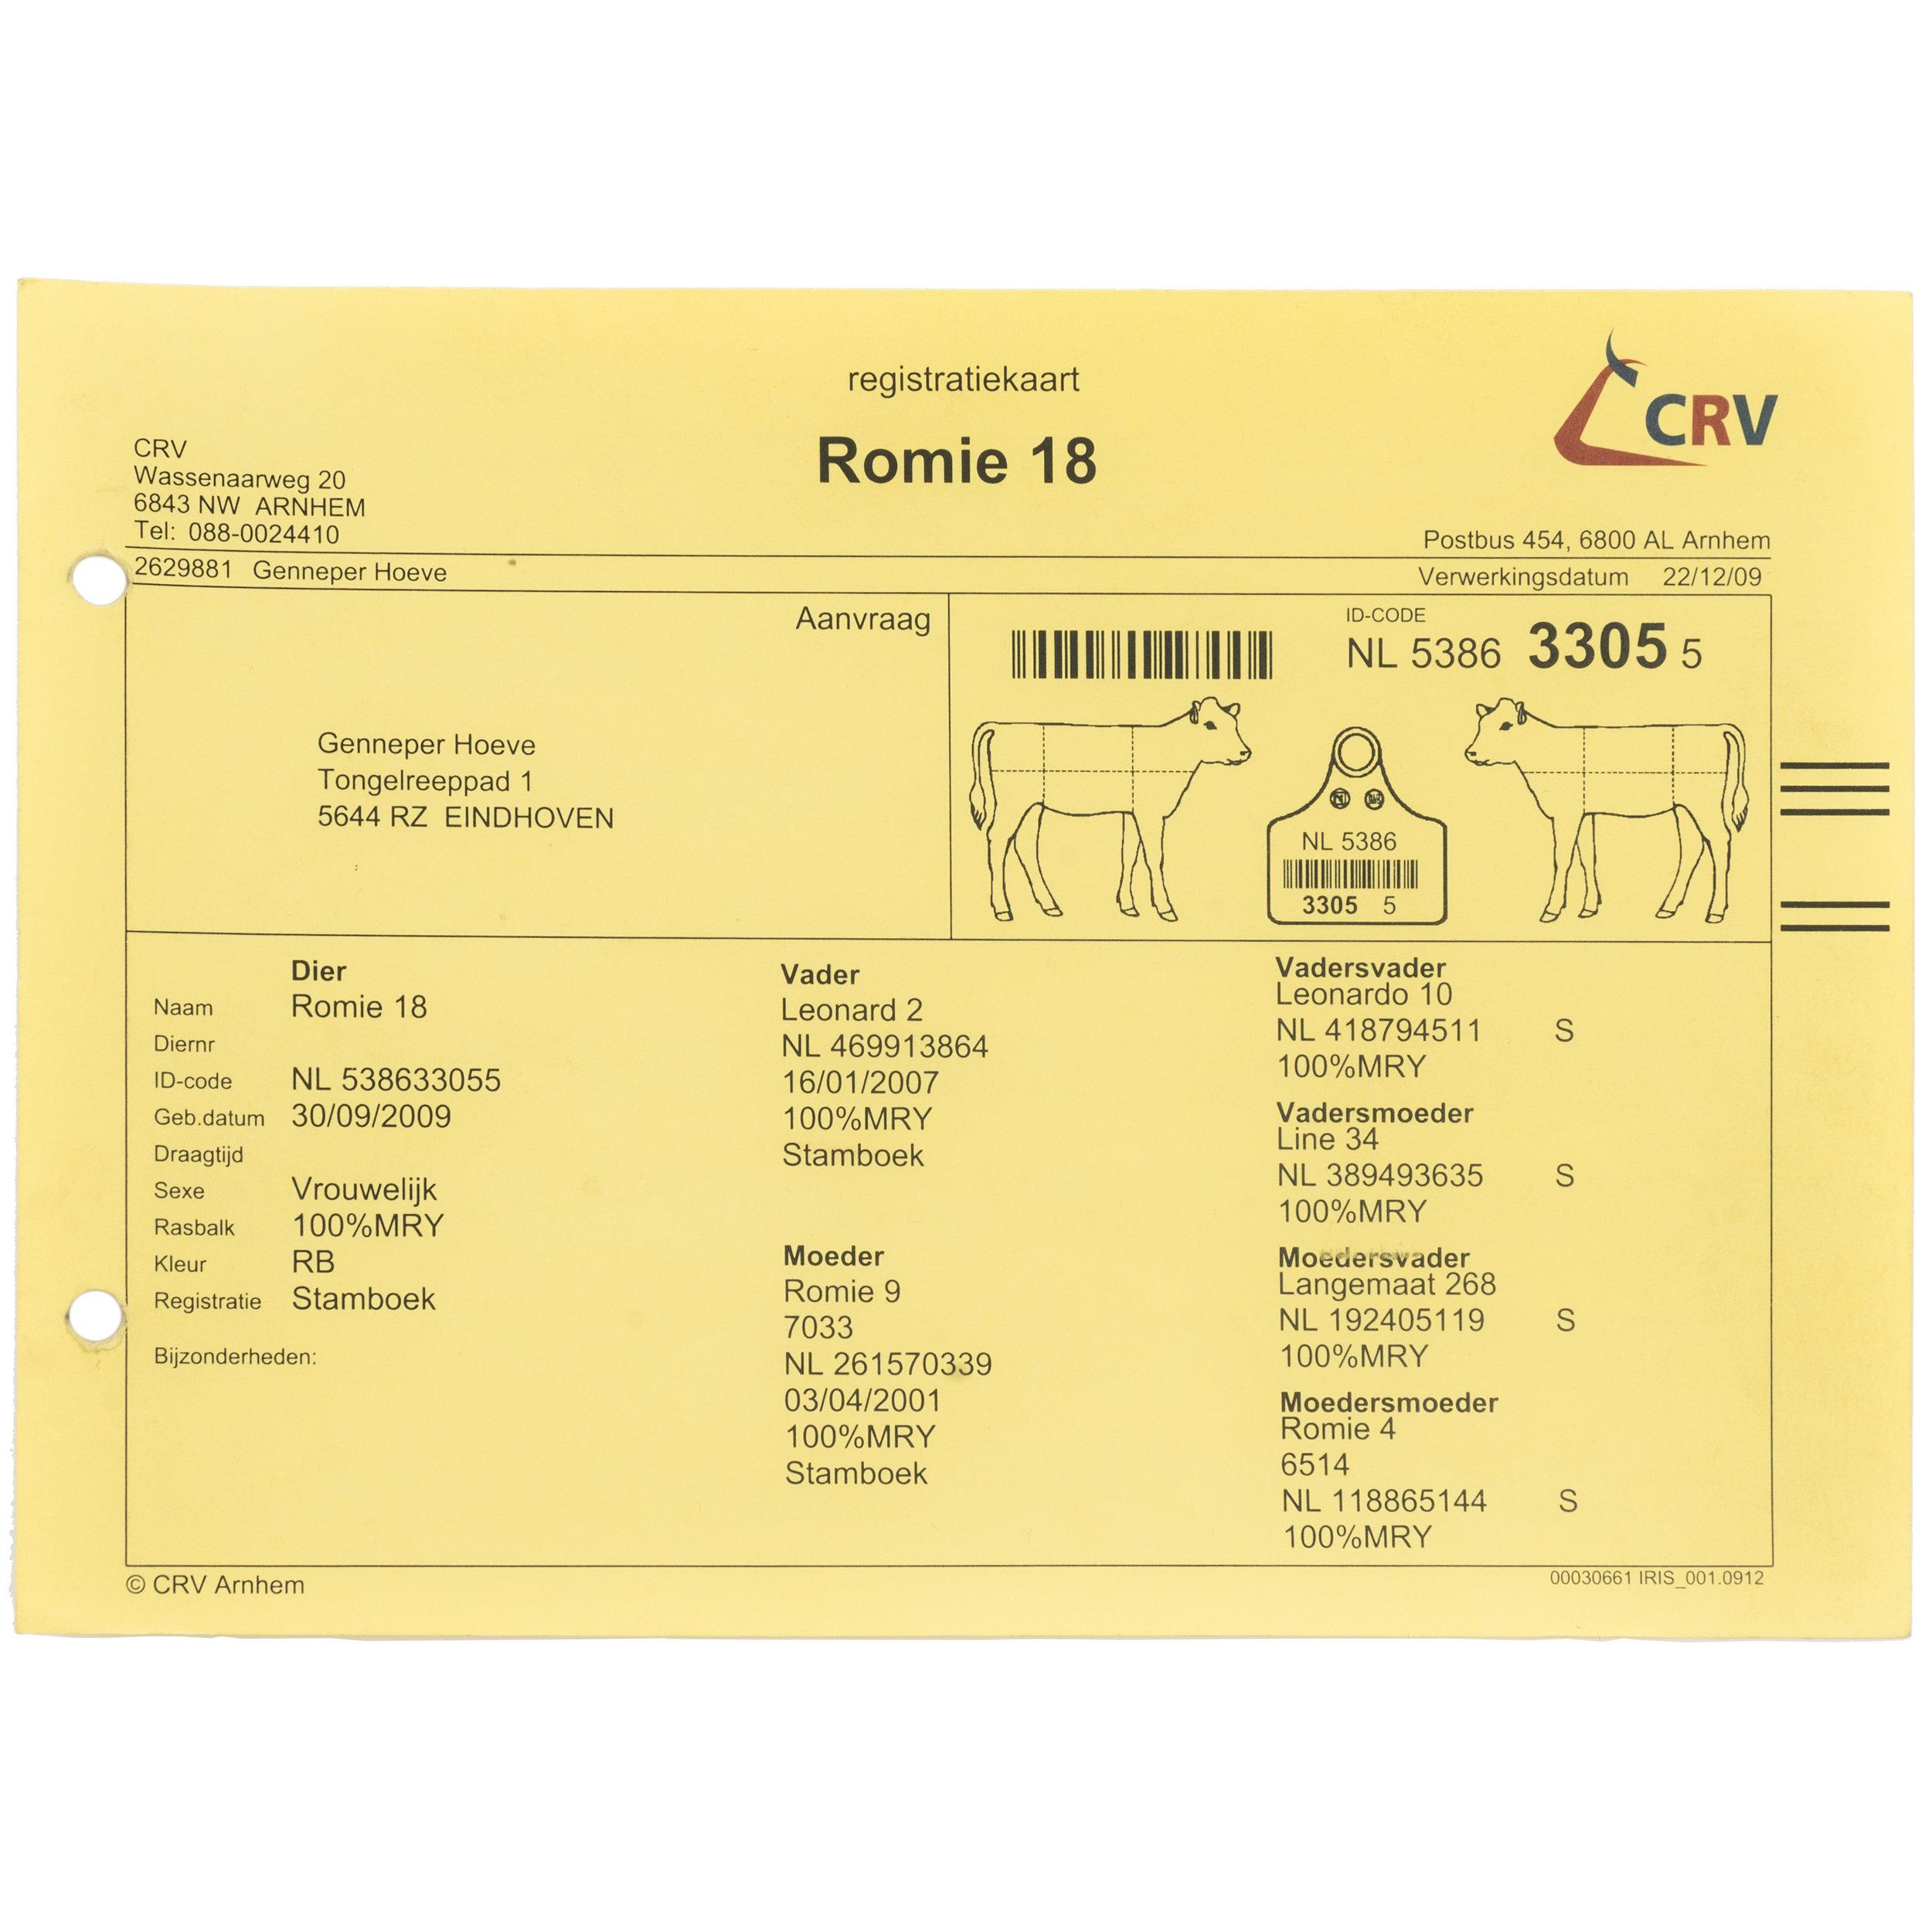 - Identity CardID Card of Romie 18.